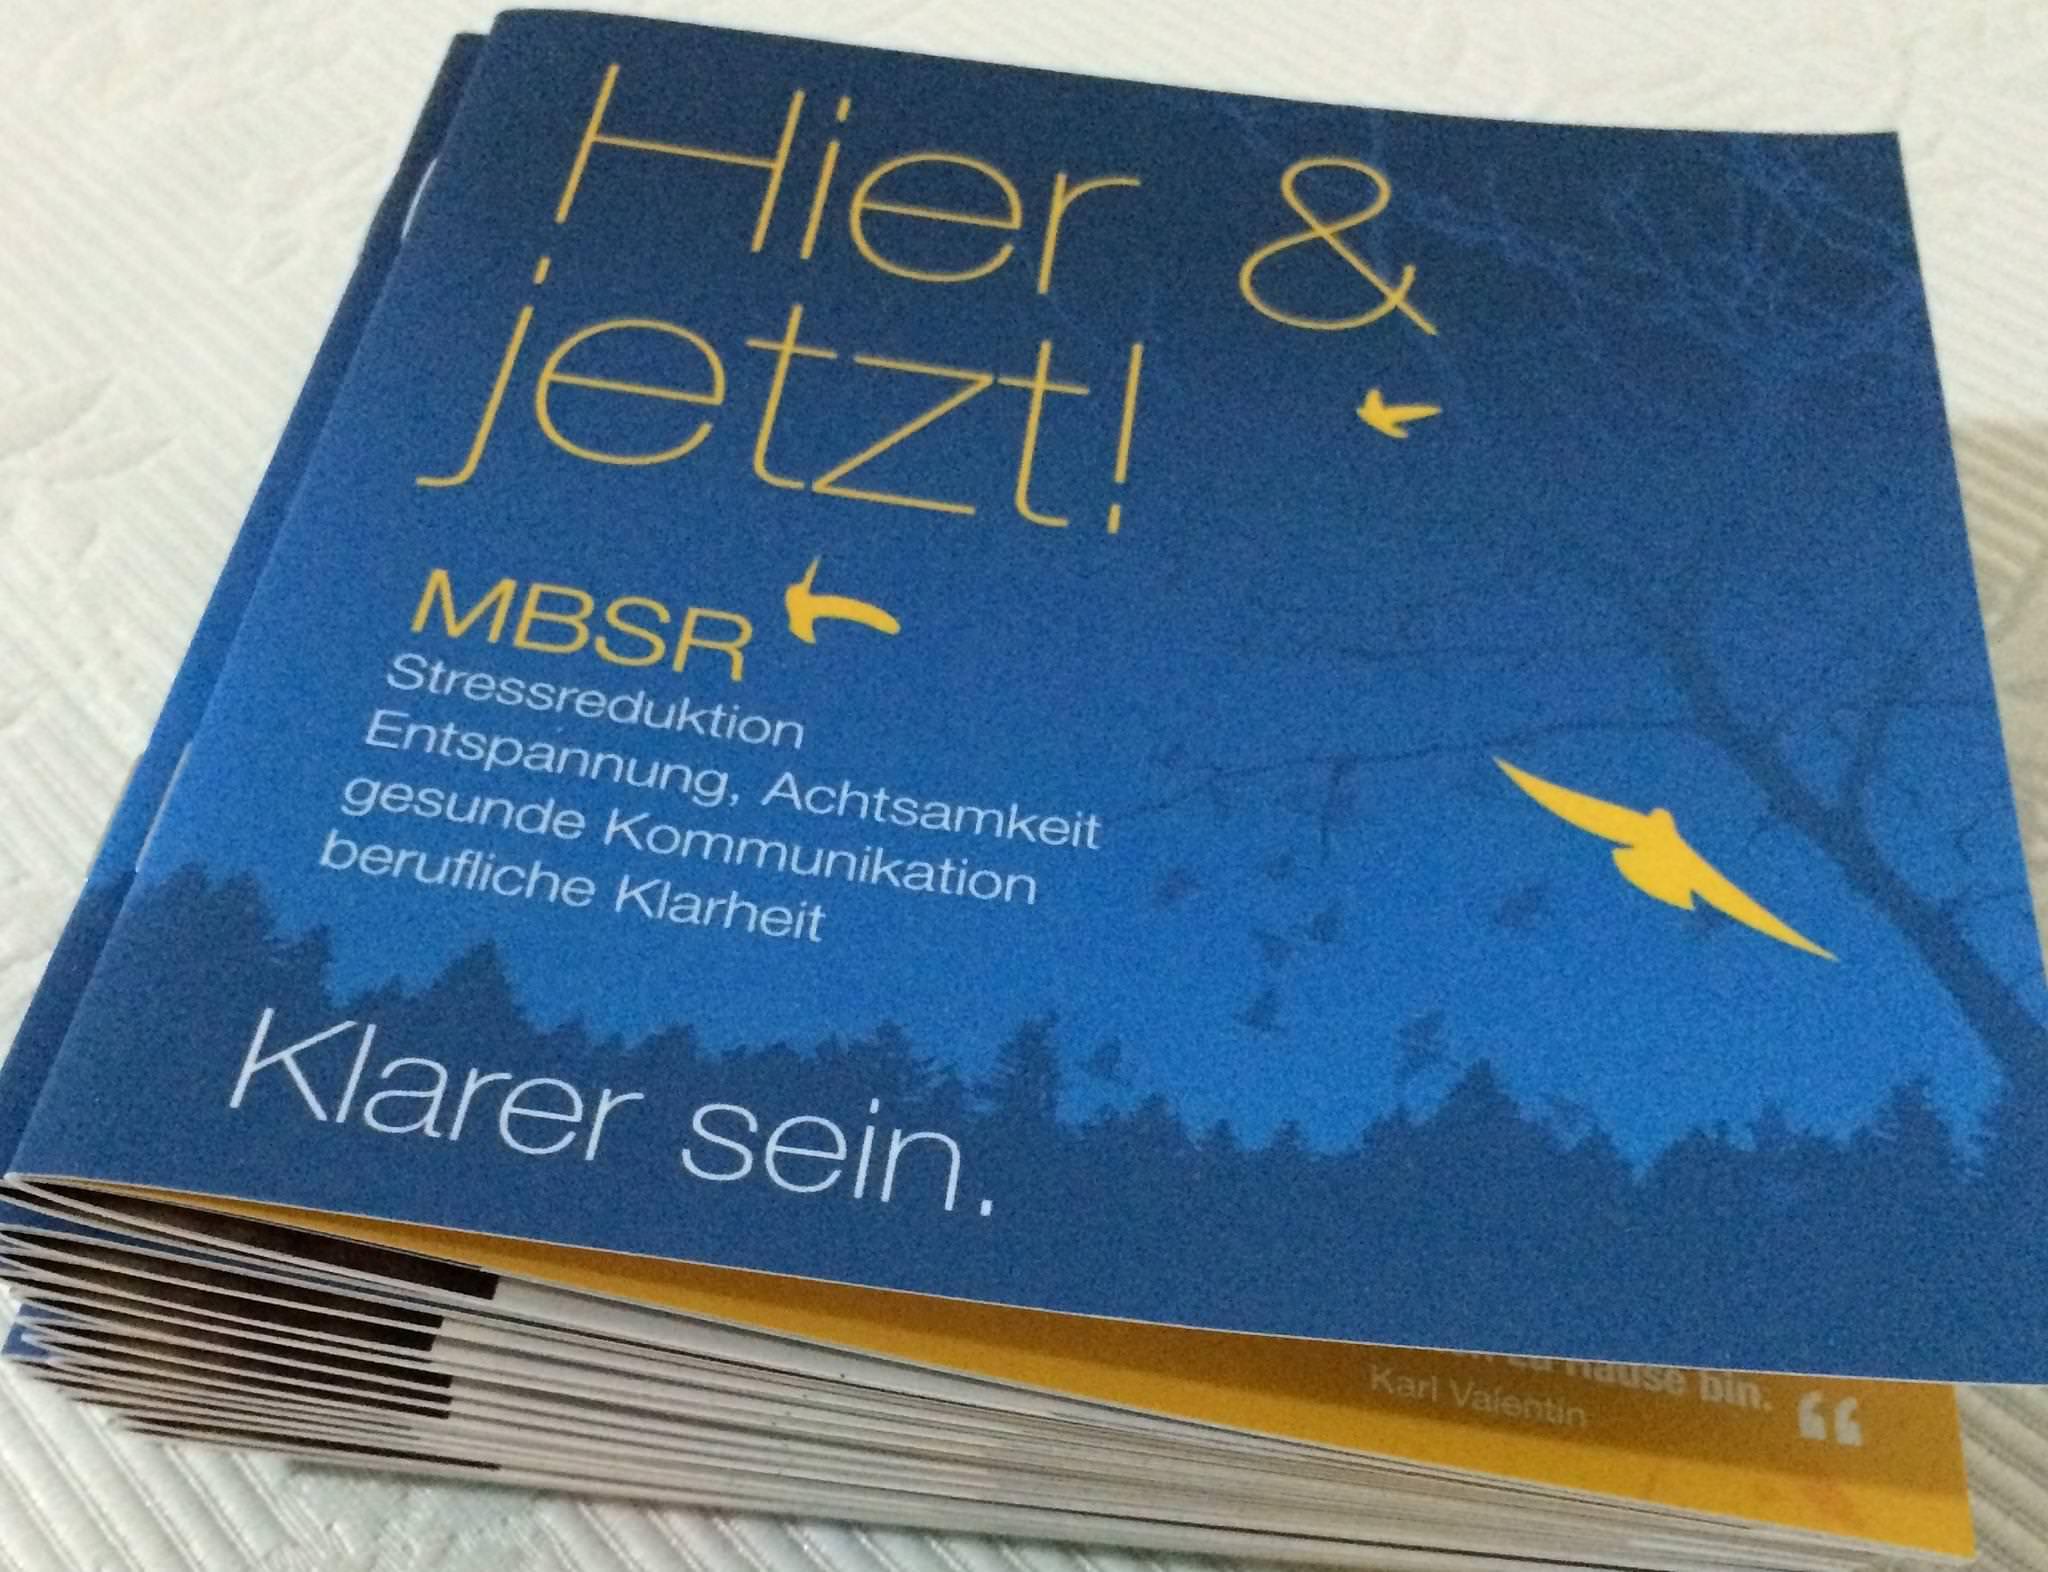 Imagebroschüre, MBSR & Stressreduktion, Marke Eigenbau (für Elke Ferstl)